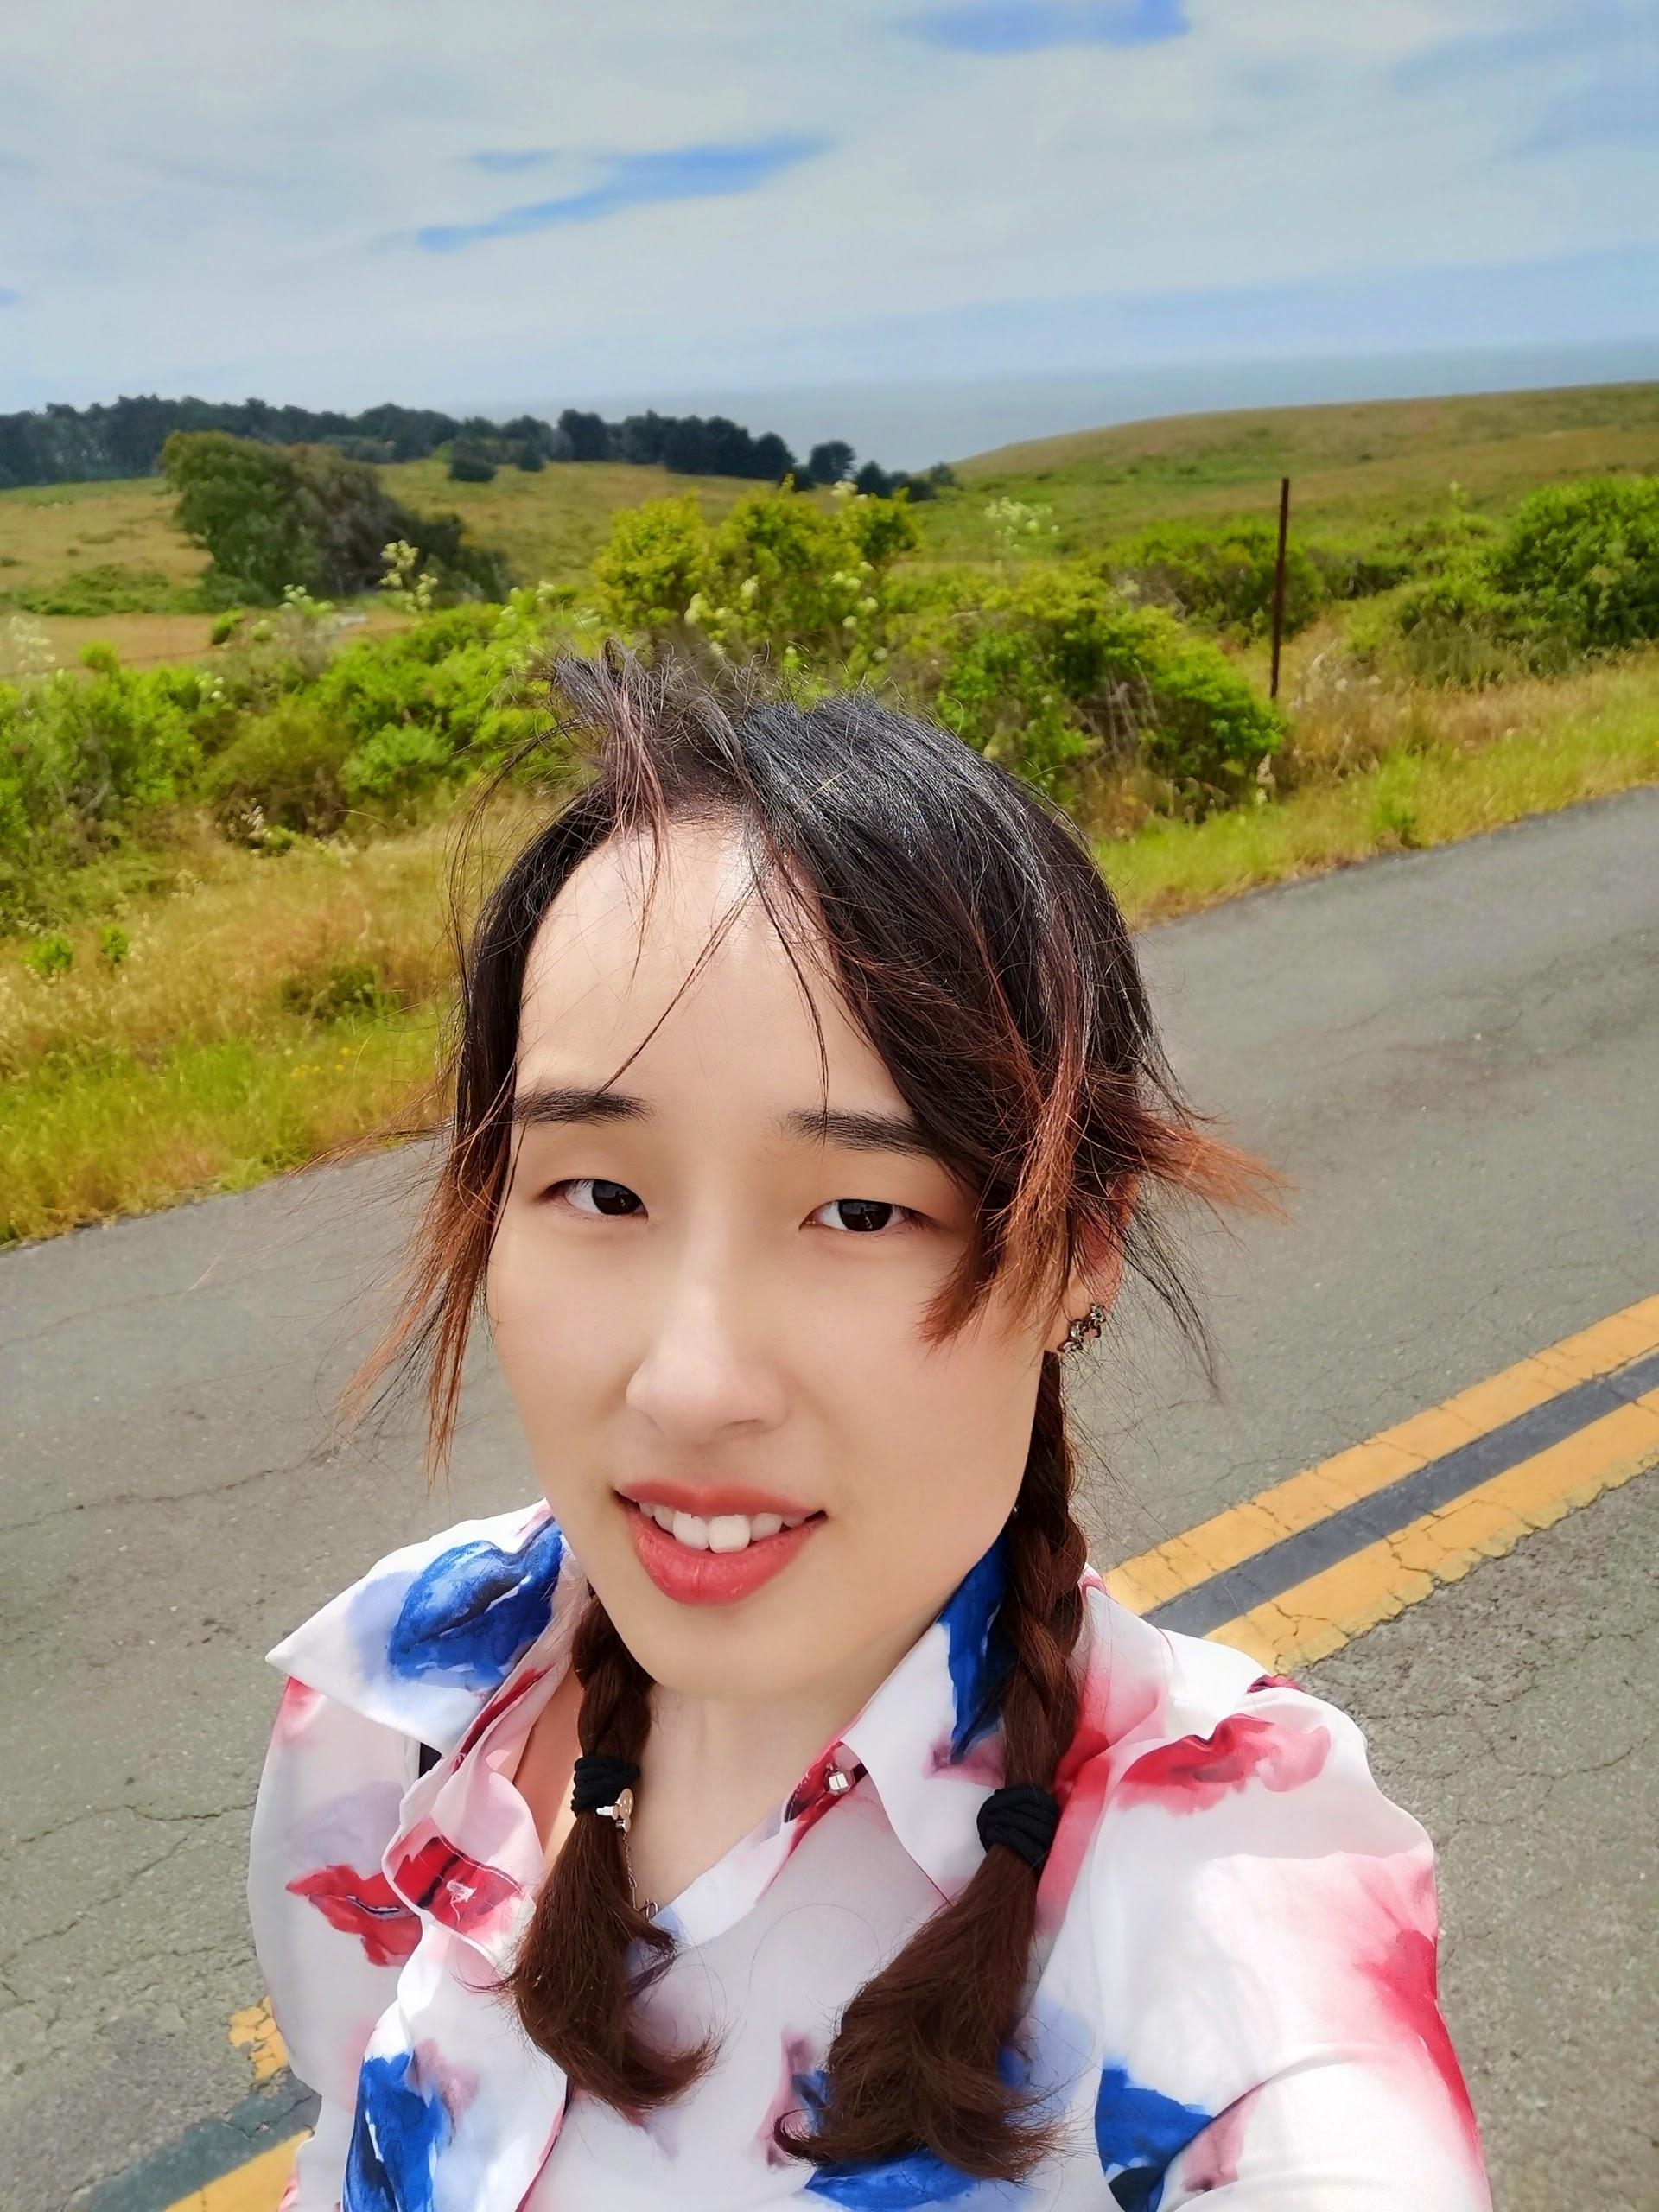 Mengying Ju